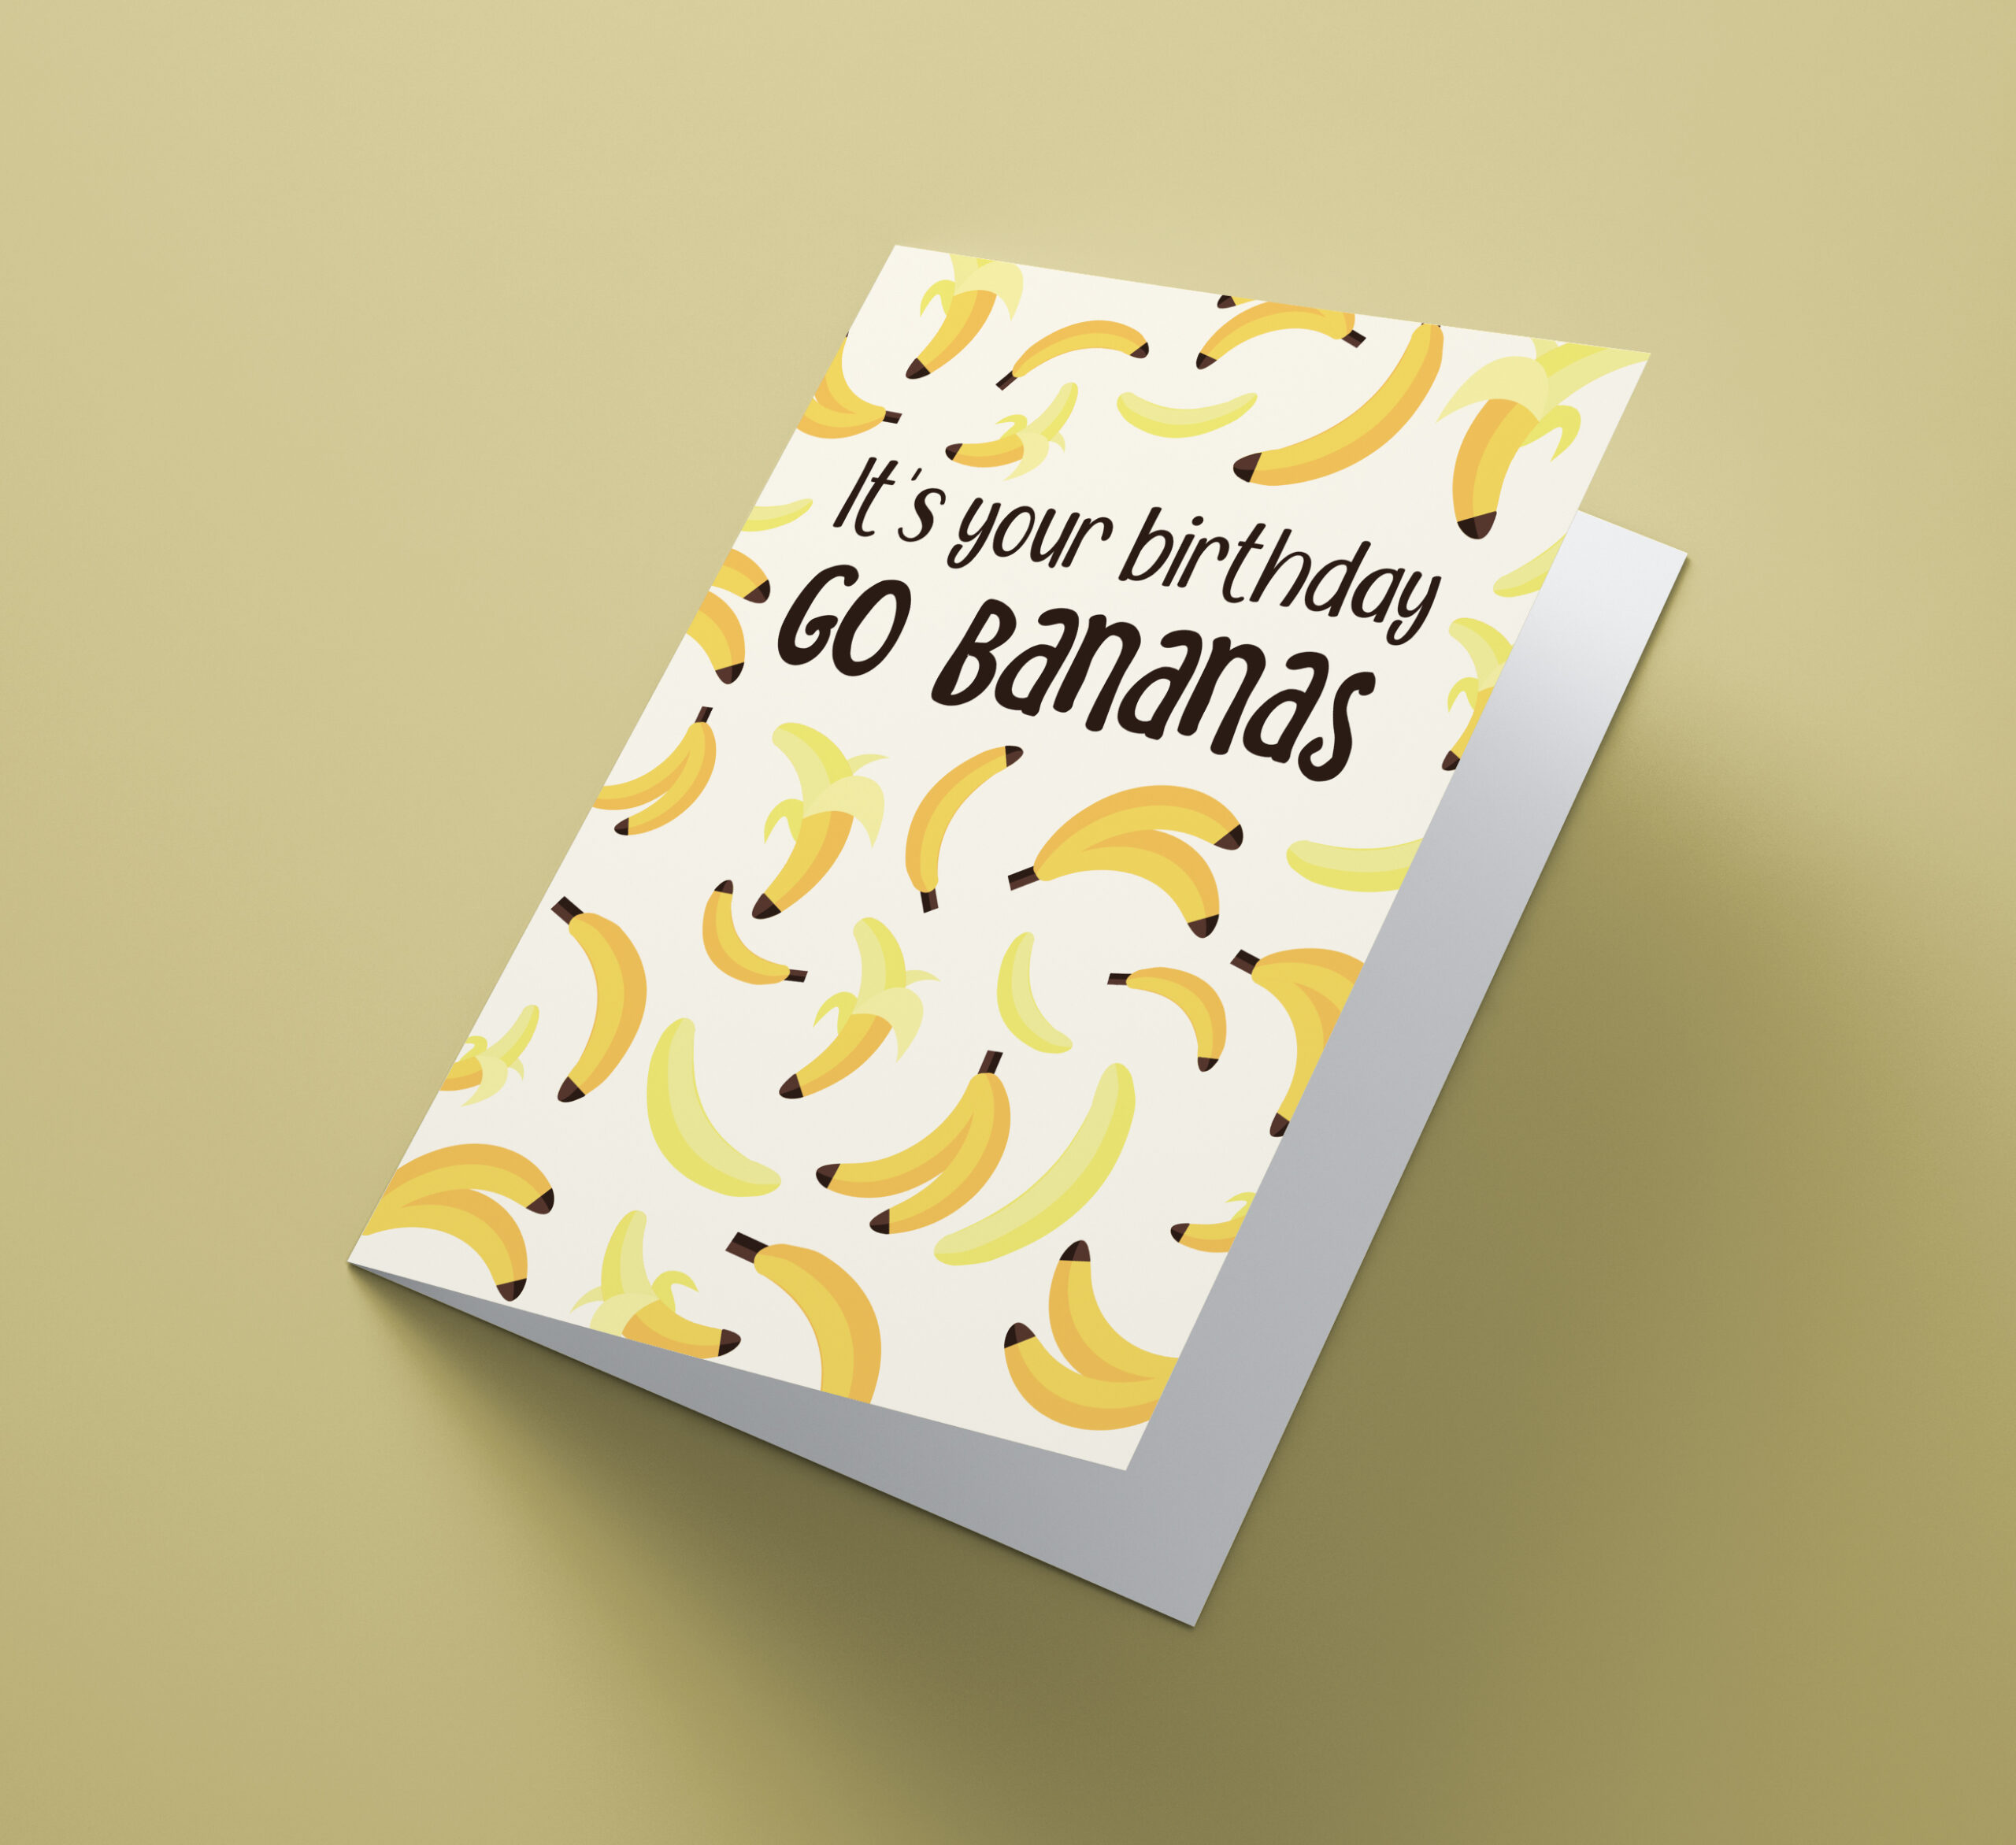 It's You Birthday, Go Bananas